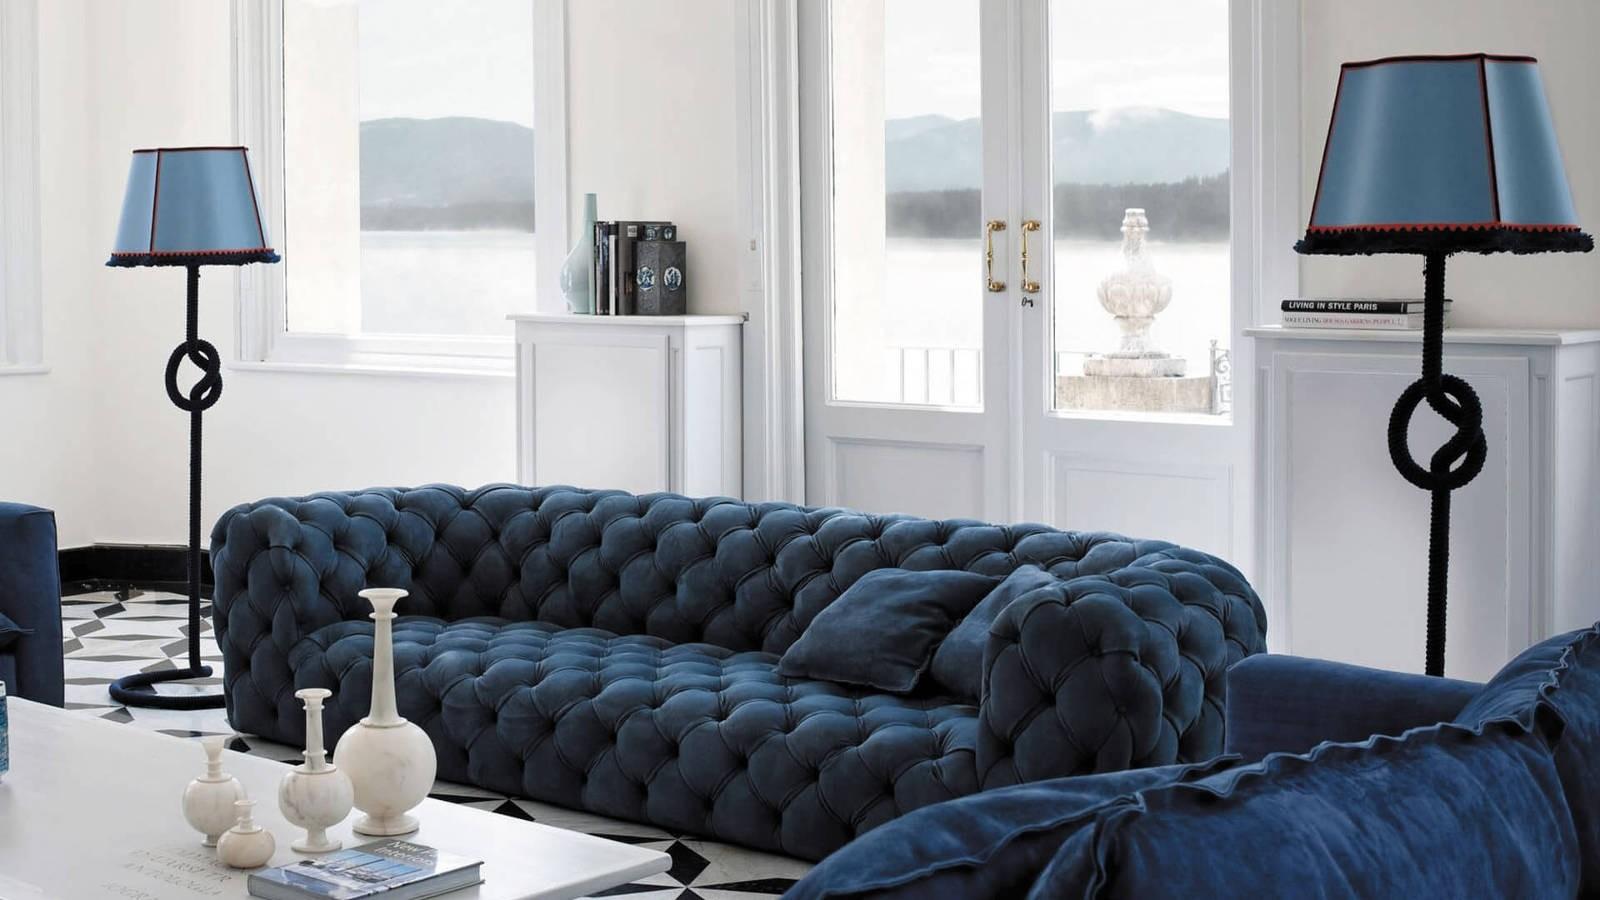 Chester moon divano baxter acquista online for Prezzi divani baxter